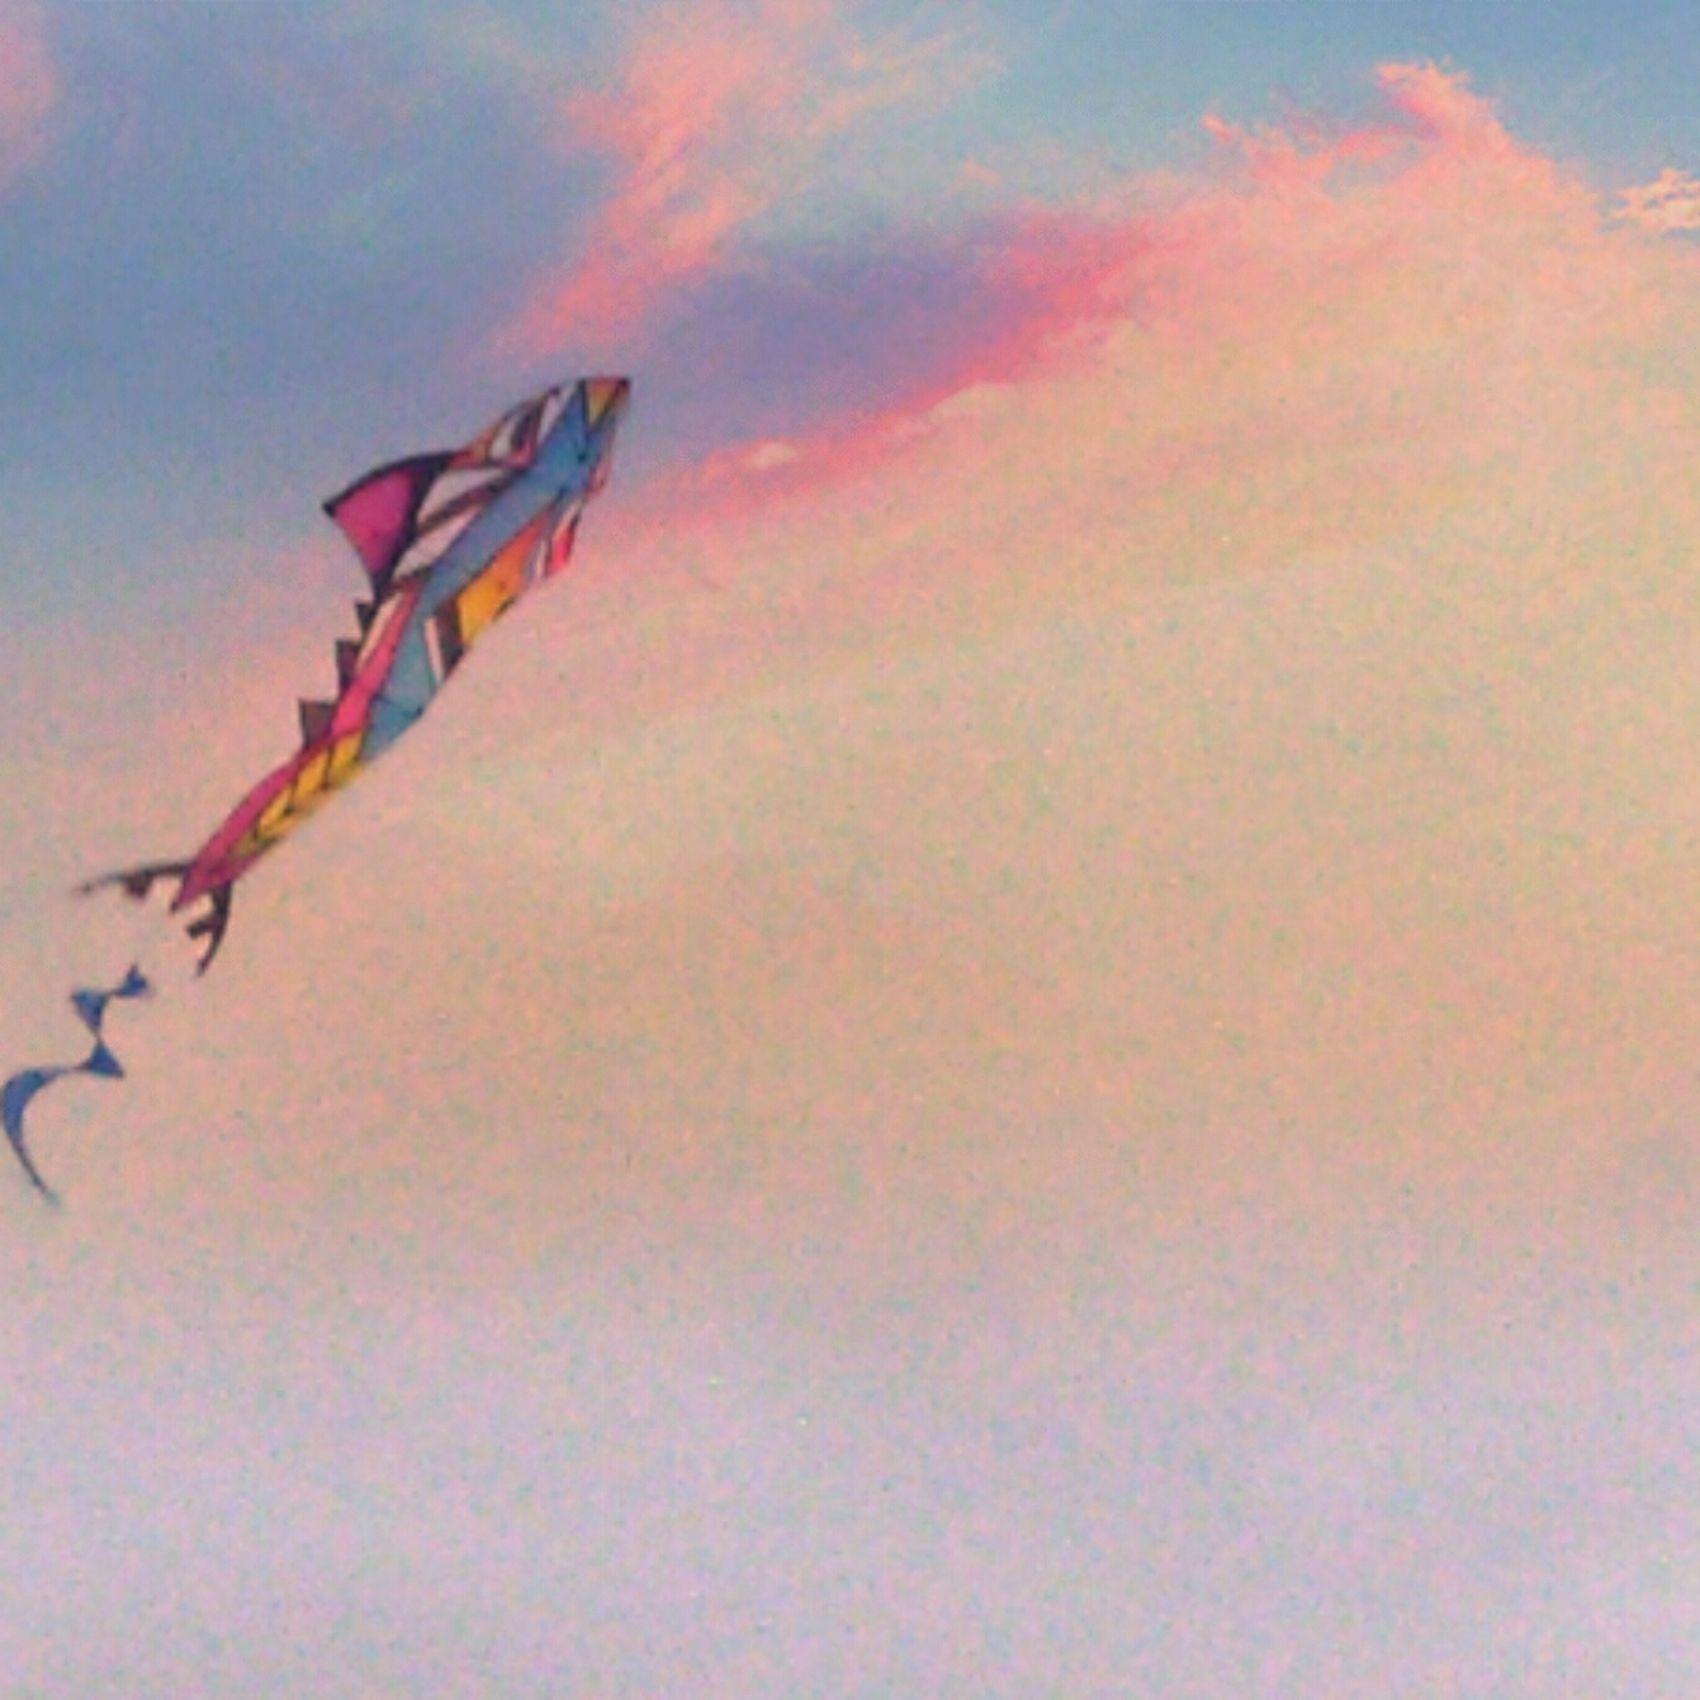 Cometas Kite Looking Up Mirar Arriba Enjoying Life Free FreeTime Photograpy Photoart Look Editing Photos Hello World Volar Para Ser Libre Light Colors Pastel Power